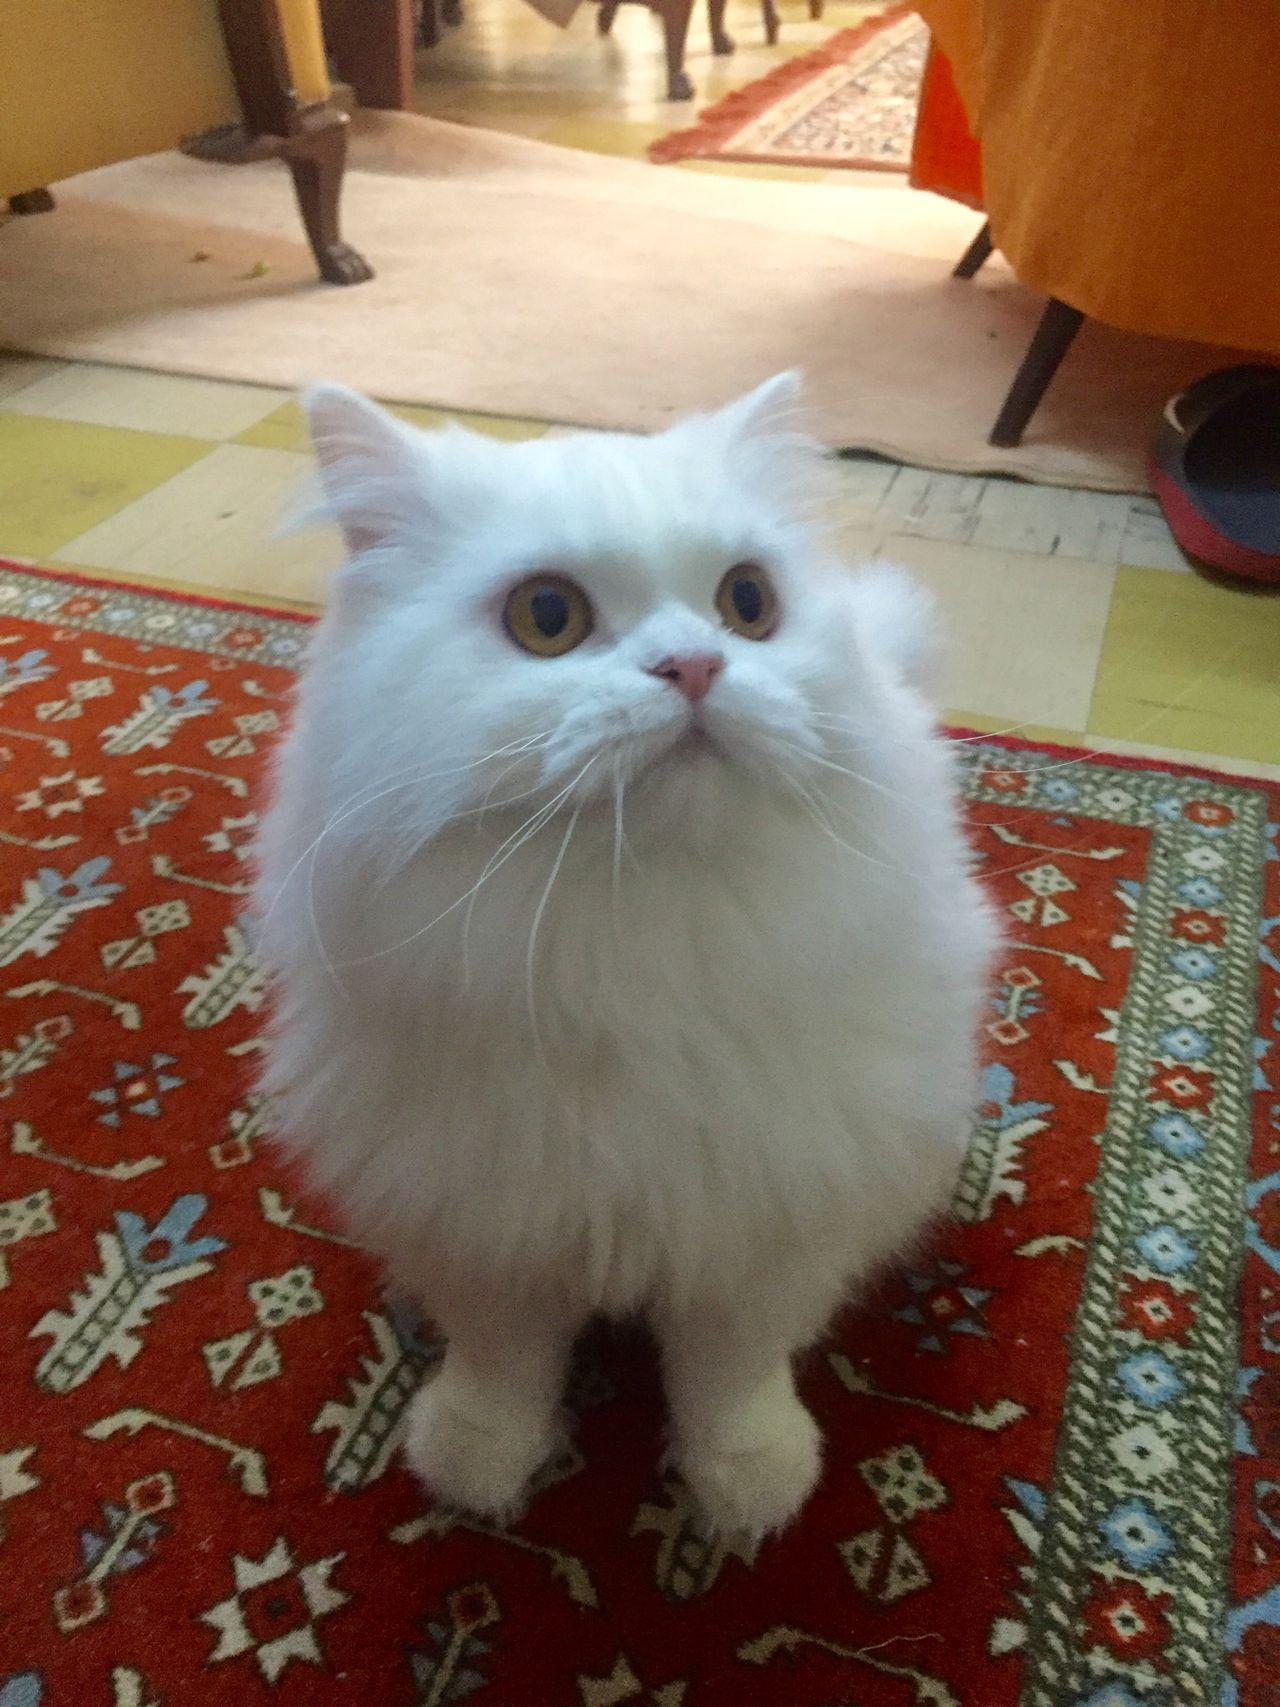 Check This Out Cat Kedi Ankarakedisi Ankaracat Whitecat Beyazkedi Maya Mayathecat